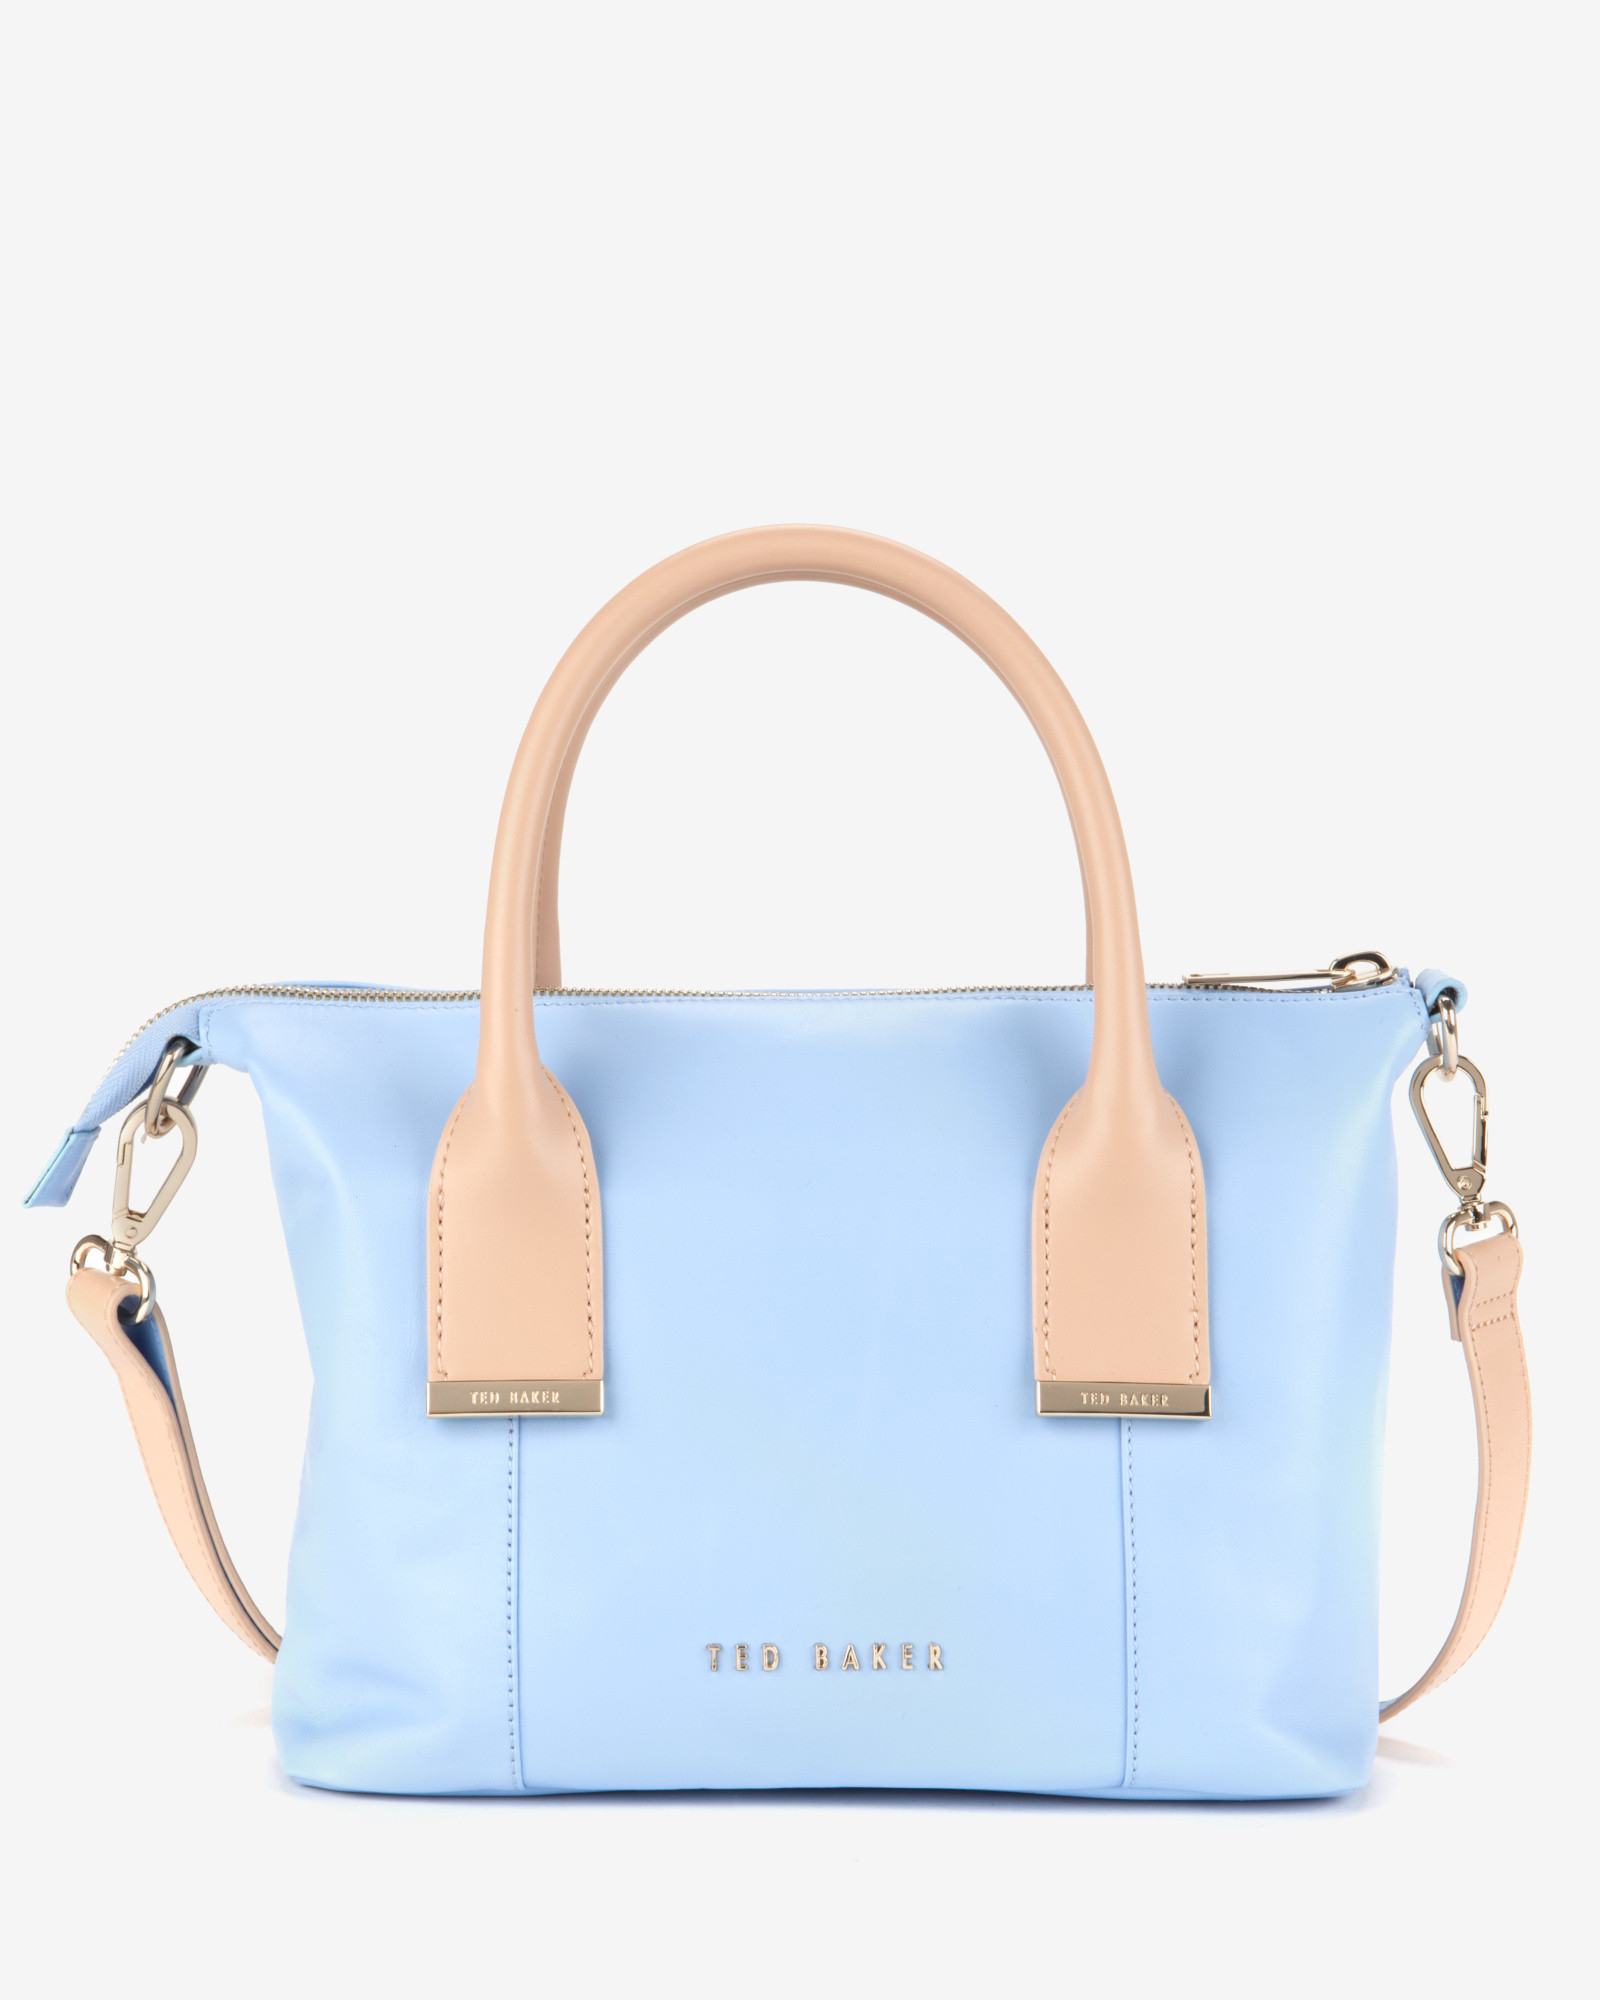 3e57efca5 Ted Baker Amelia Leather Mini Tote Bag in Blue - Lyst